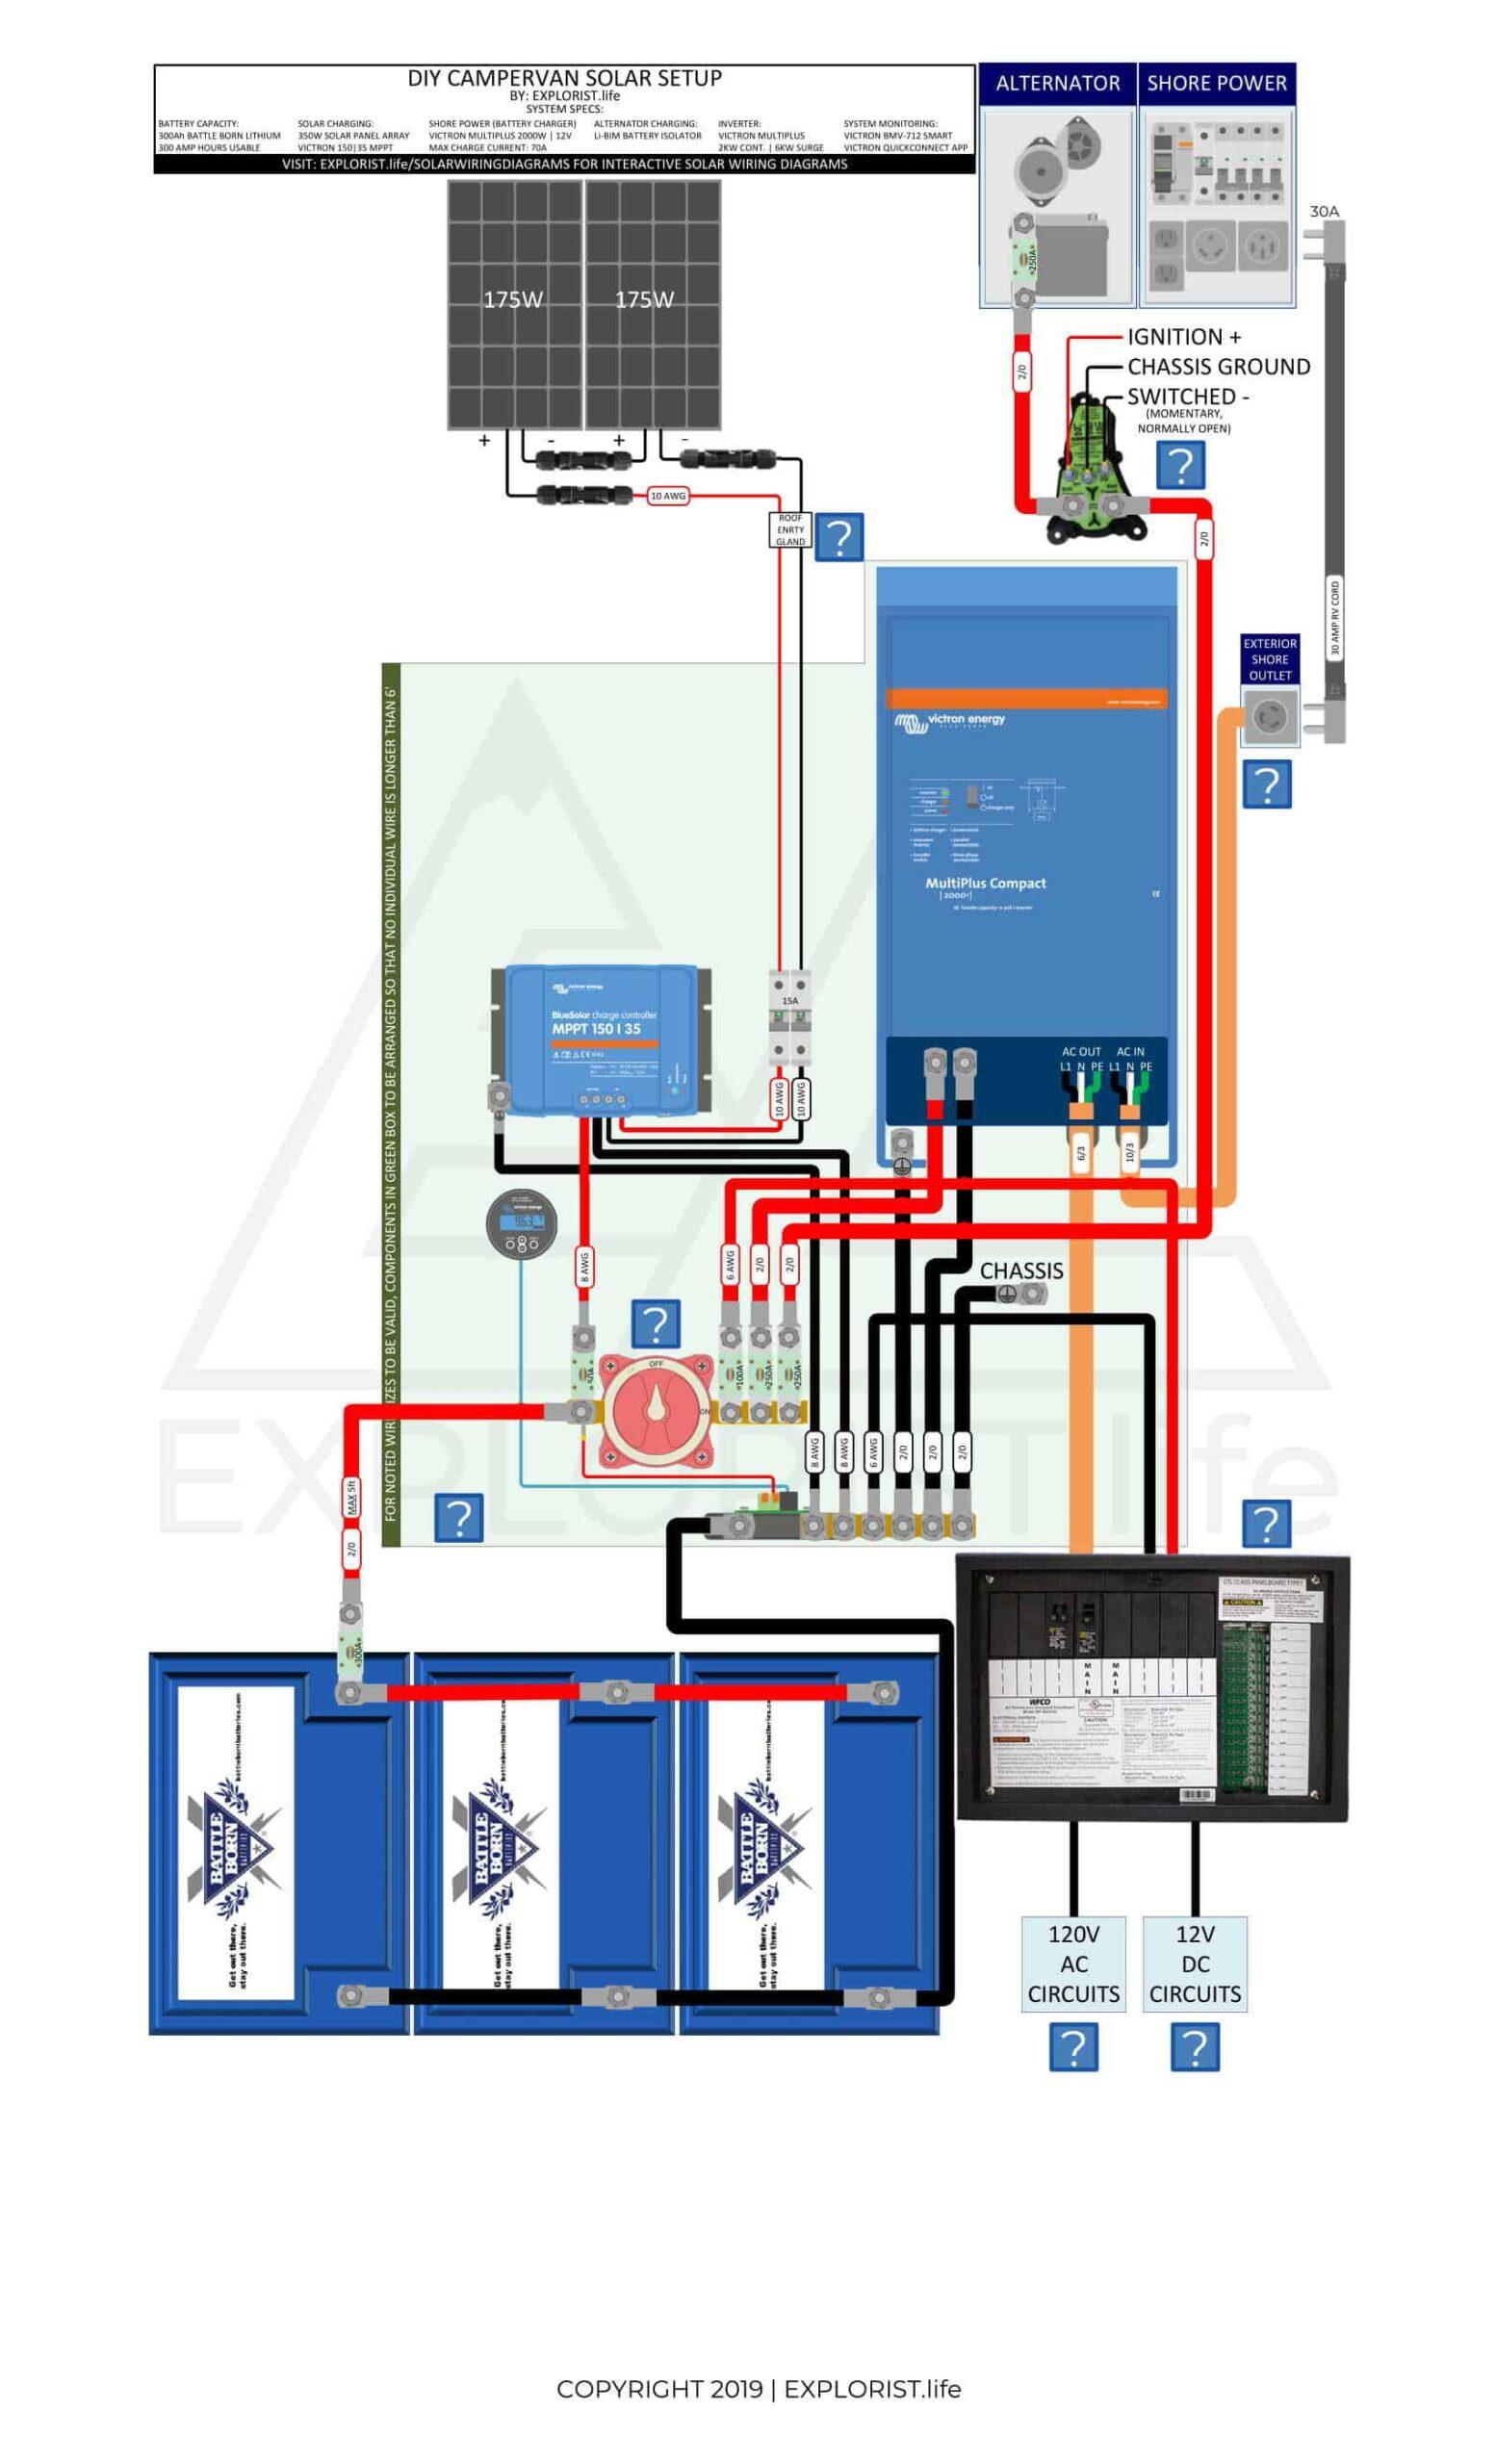 300Ah Lithium Battery Bank – 2x175W Solar – 2kW Inverter/Charger – Li-BIM Alternator Charging